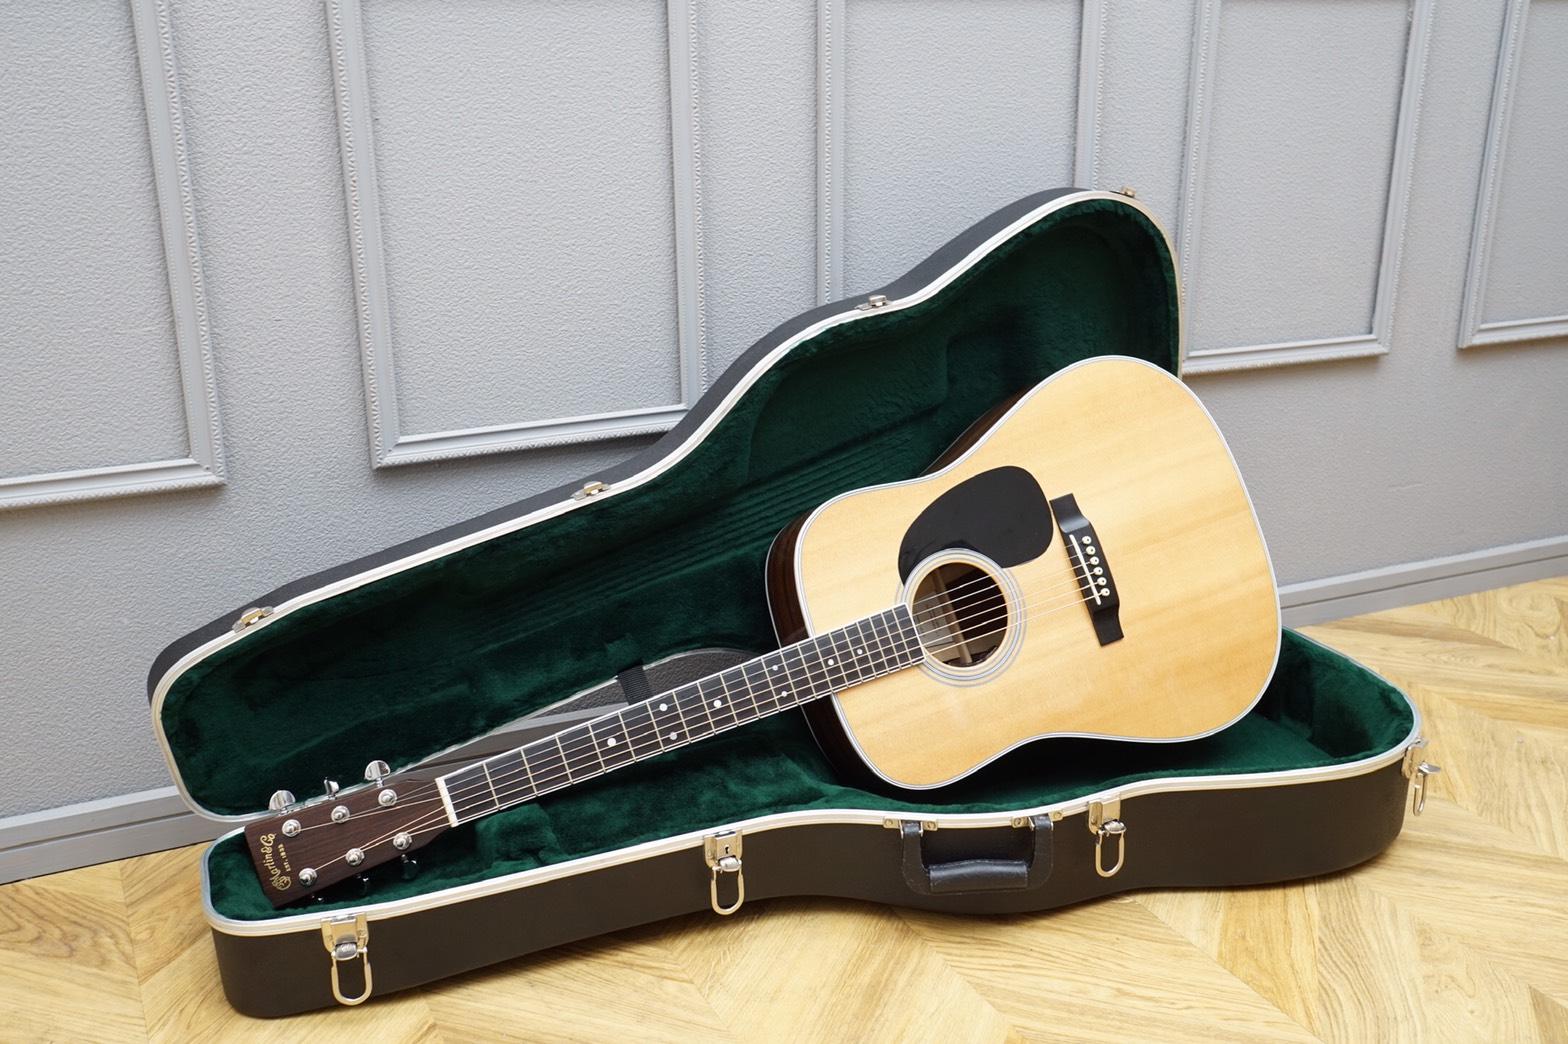 Martinマーチン アコースティックギター D-35 standard model 2016年製造4